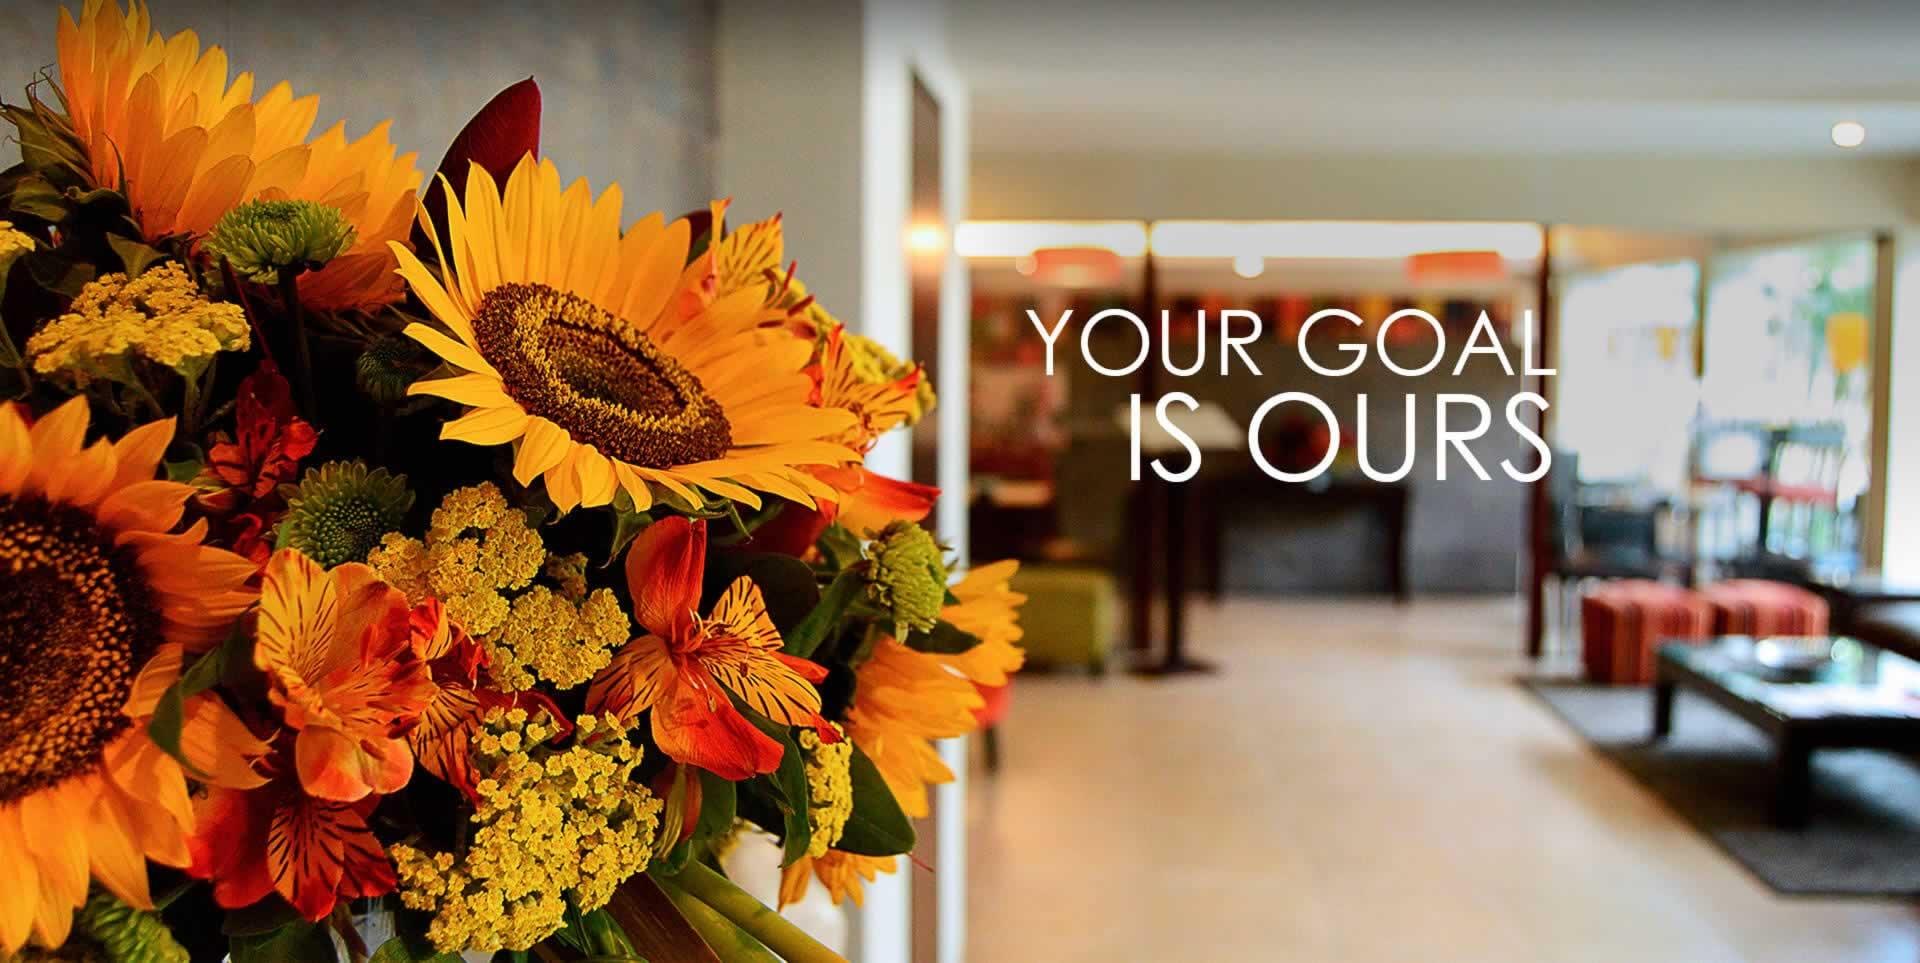 GIRASOLES HOTEL (@losgirasoleshotel) Cover Image